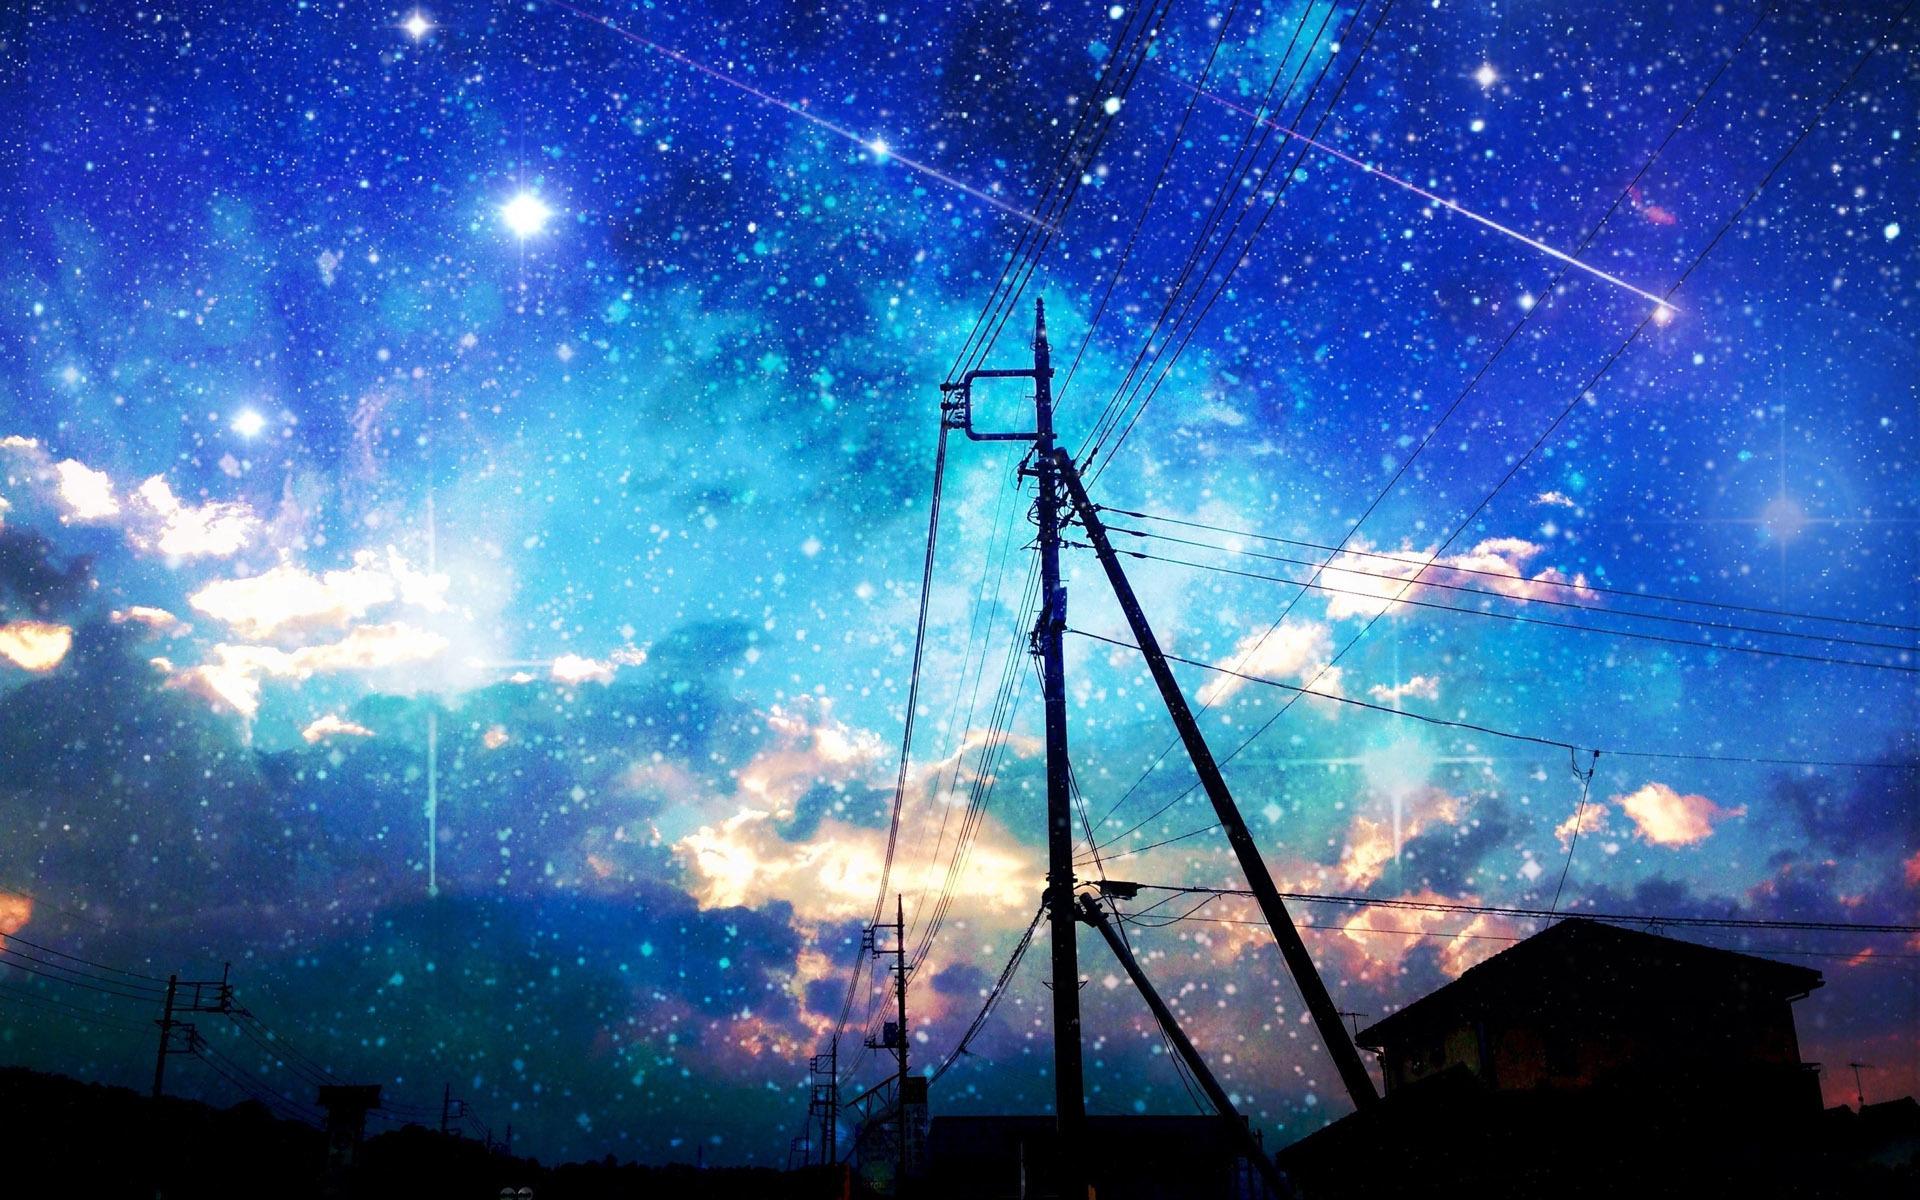 Starry Sky Wallpaper Anime Starry Sky Background 852131 Hd